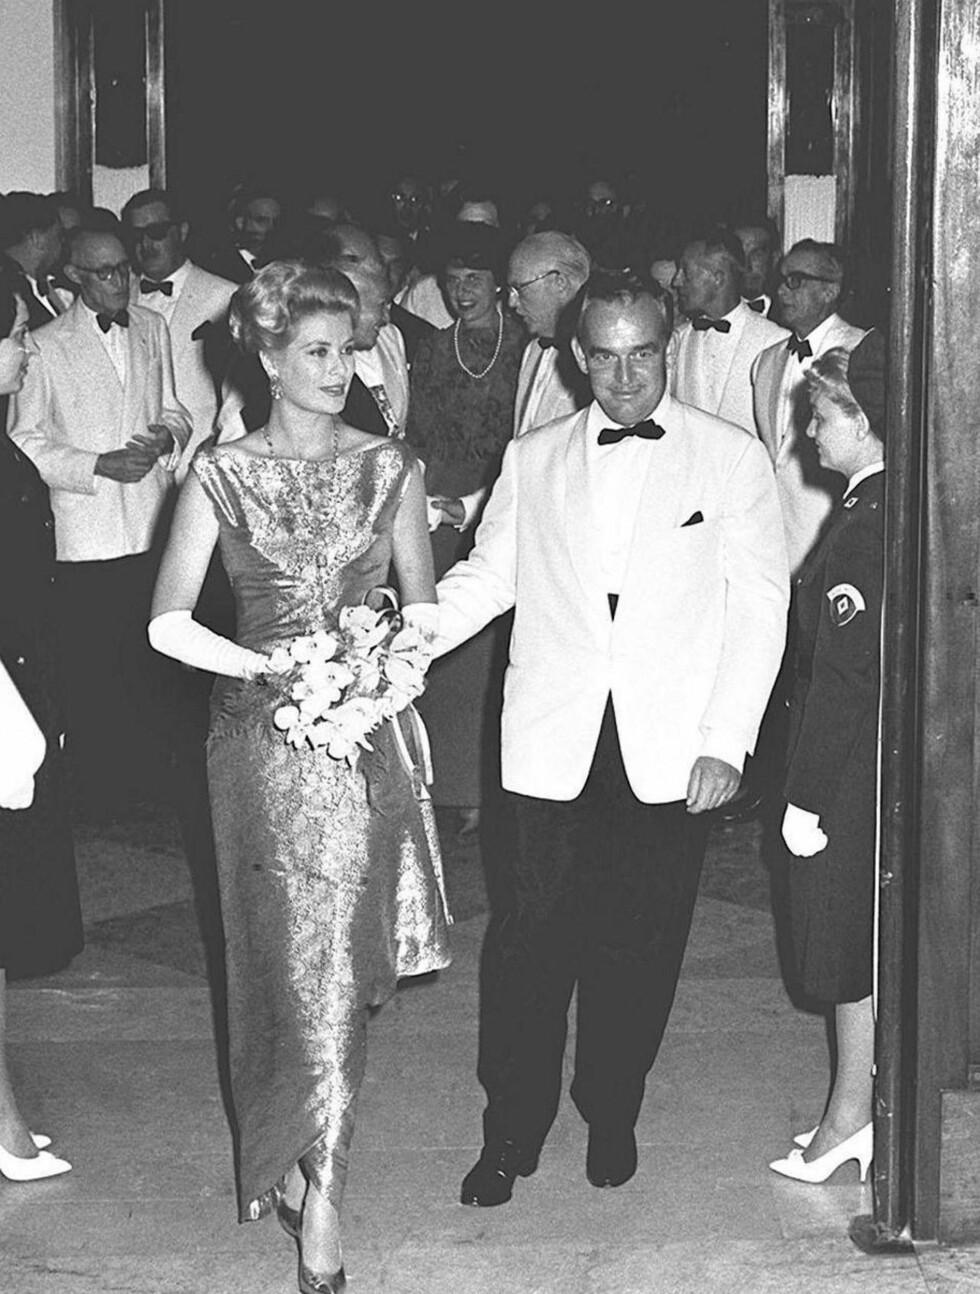 <strong>ELEGANT PAR:</strong> Fyrst Rainier og hans kone Grace Kelly på ball i 1961. Foto: Stella Pictures